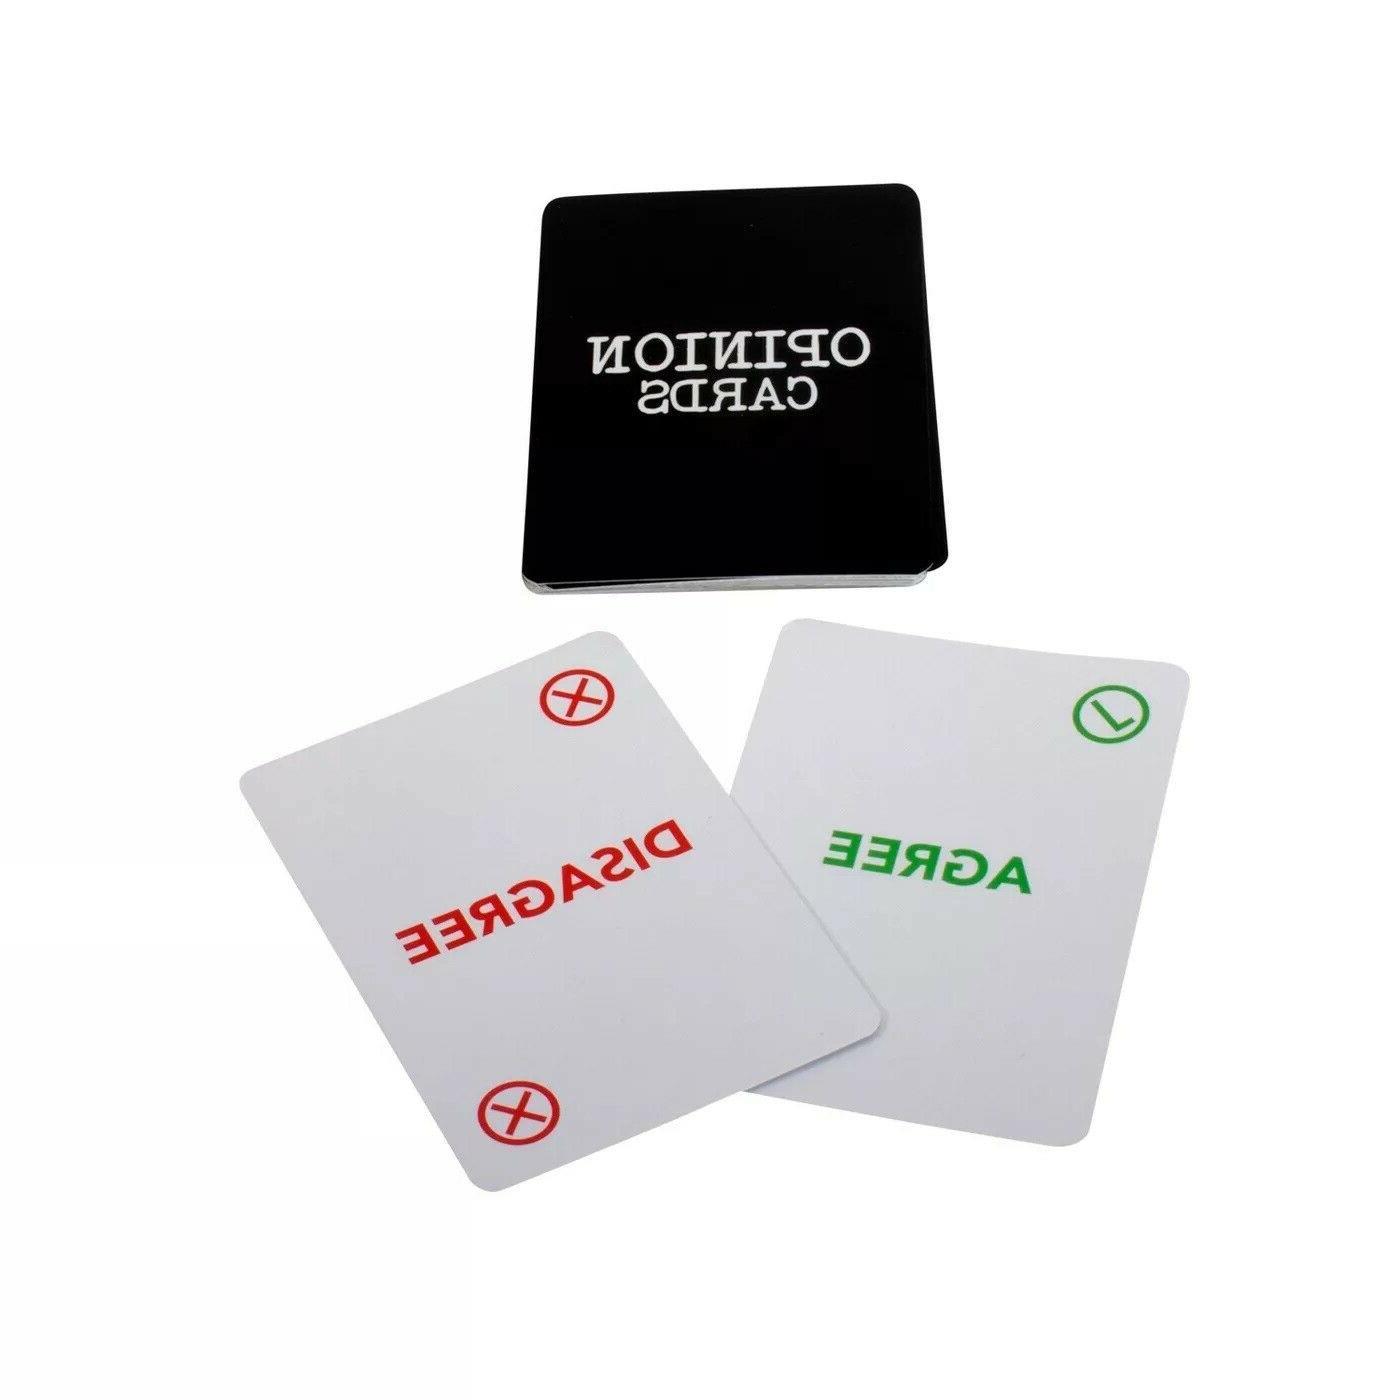 RBG - I Board Games